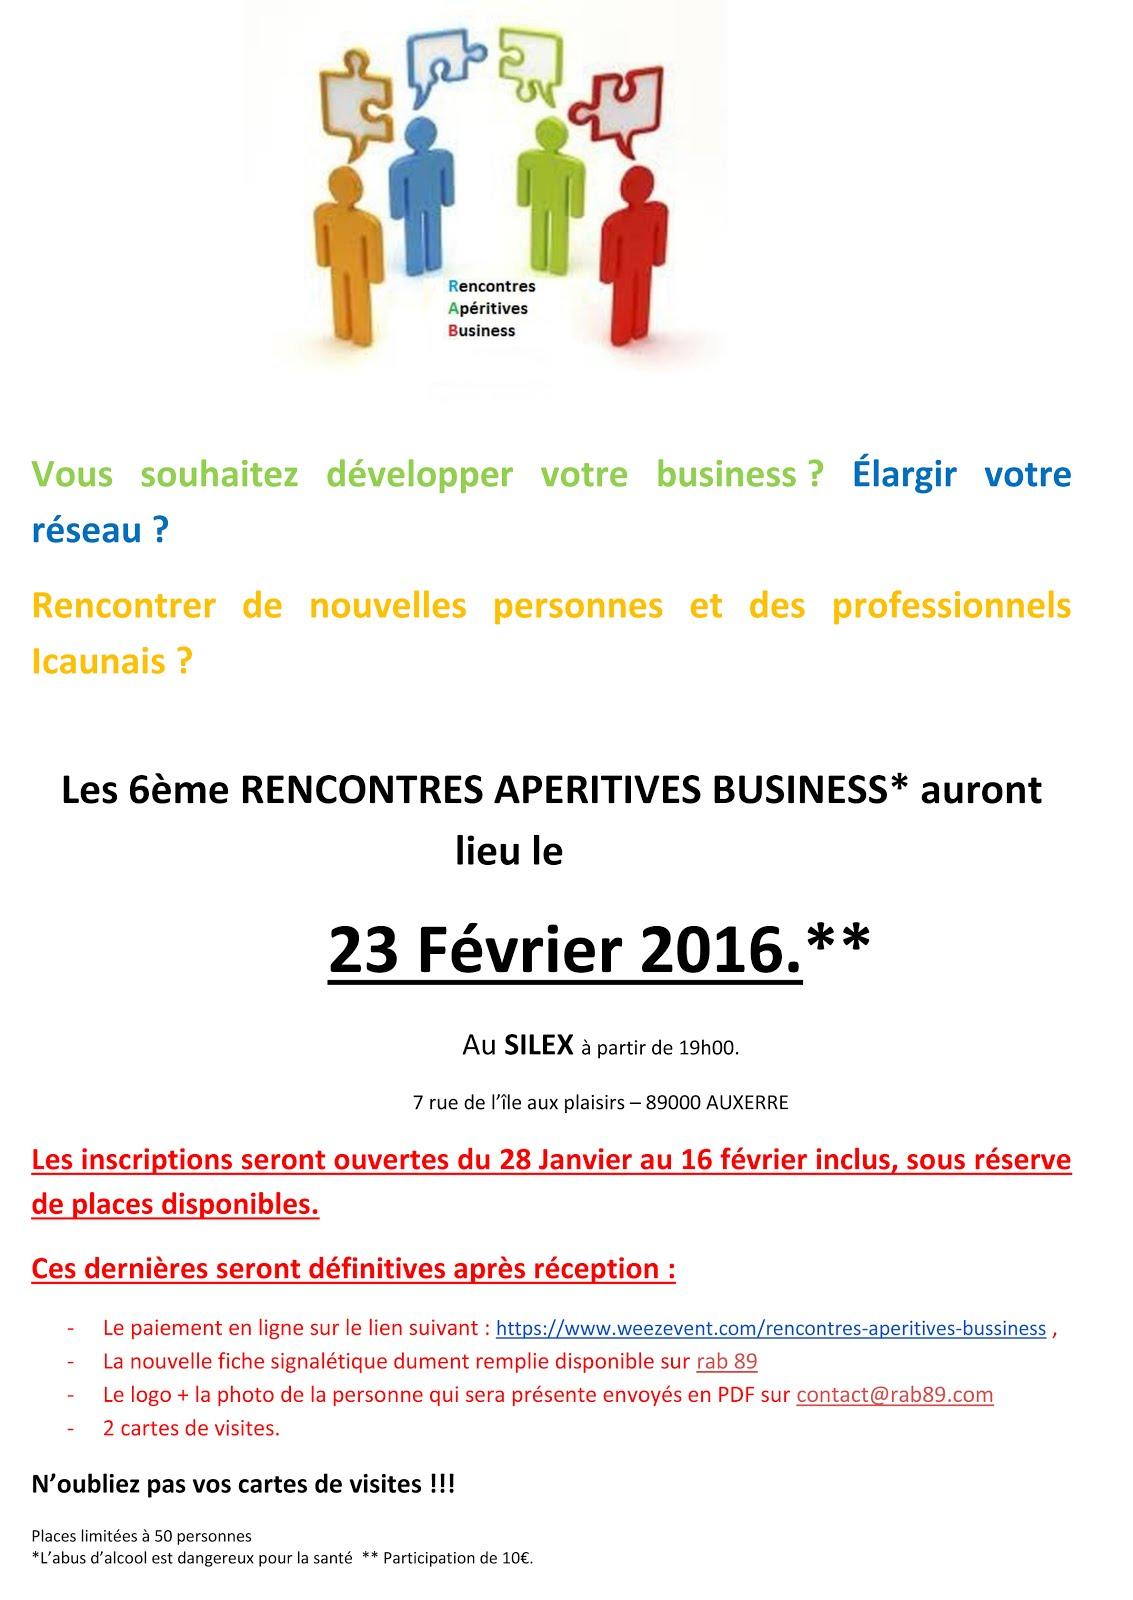 Rencontre business